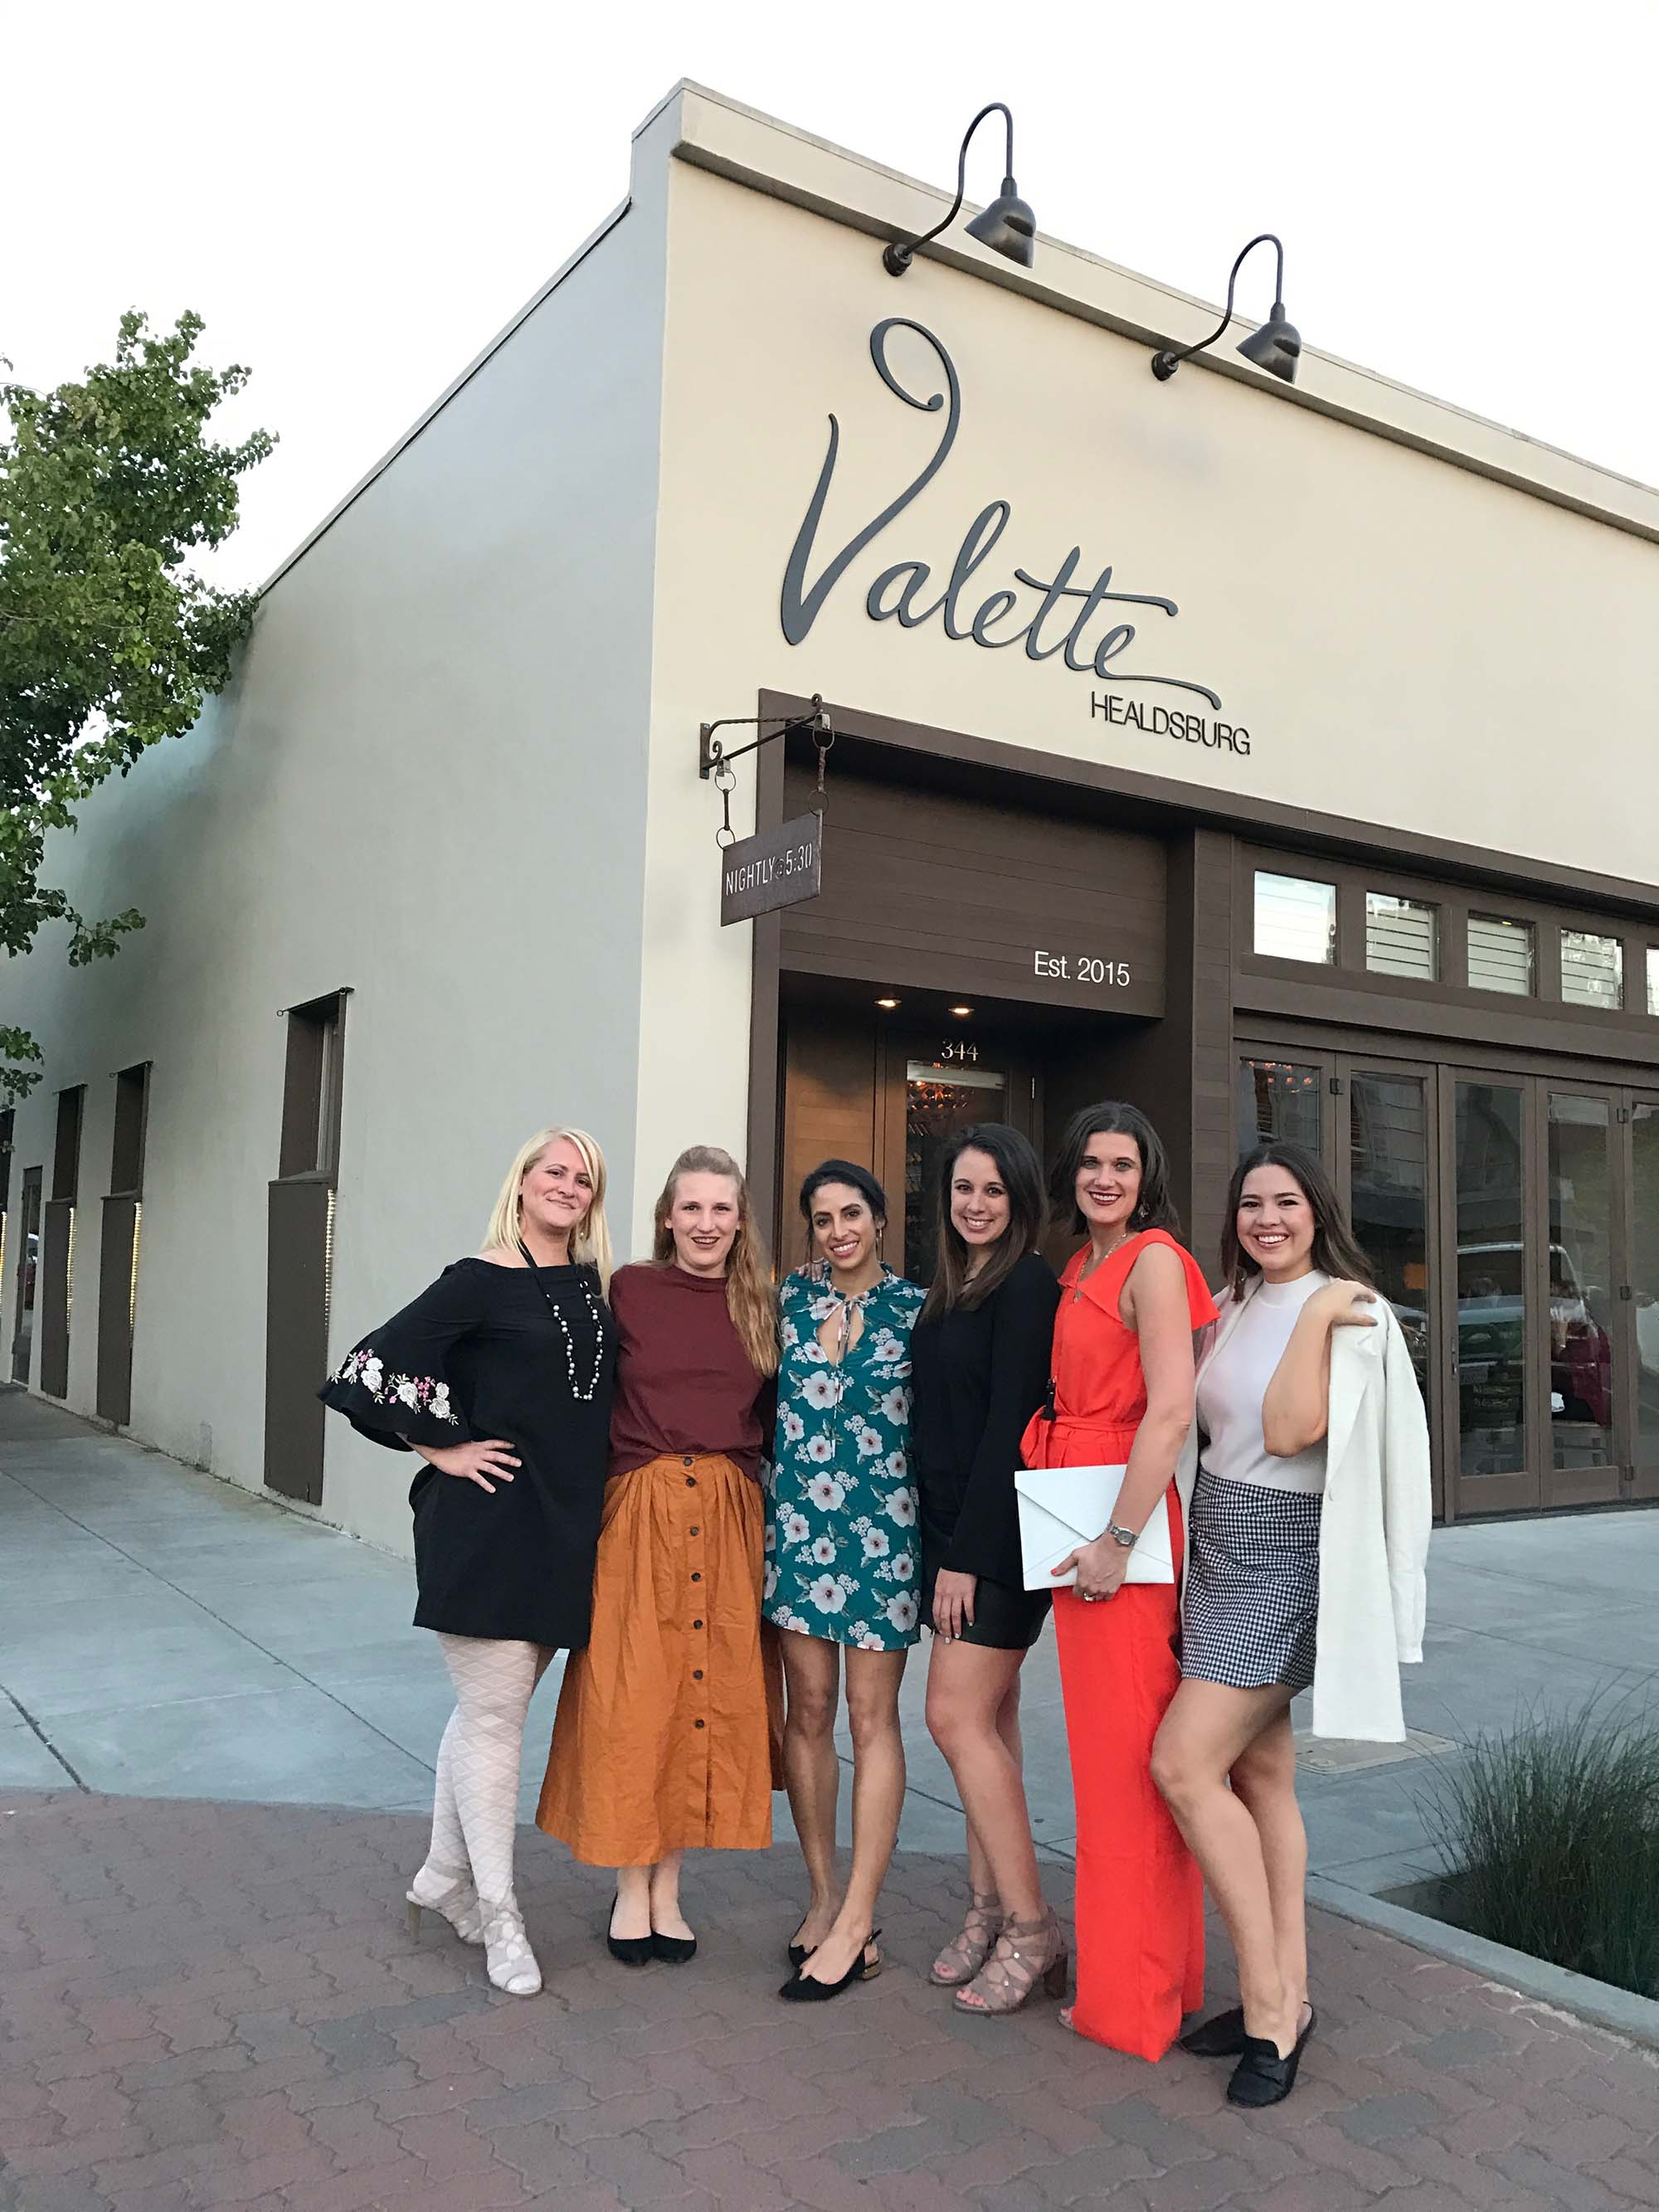 Dinner at  Valette Restaurant  during our Healdsburg Bloggers weekend